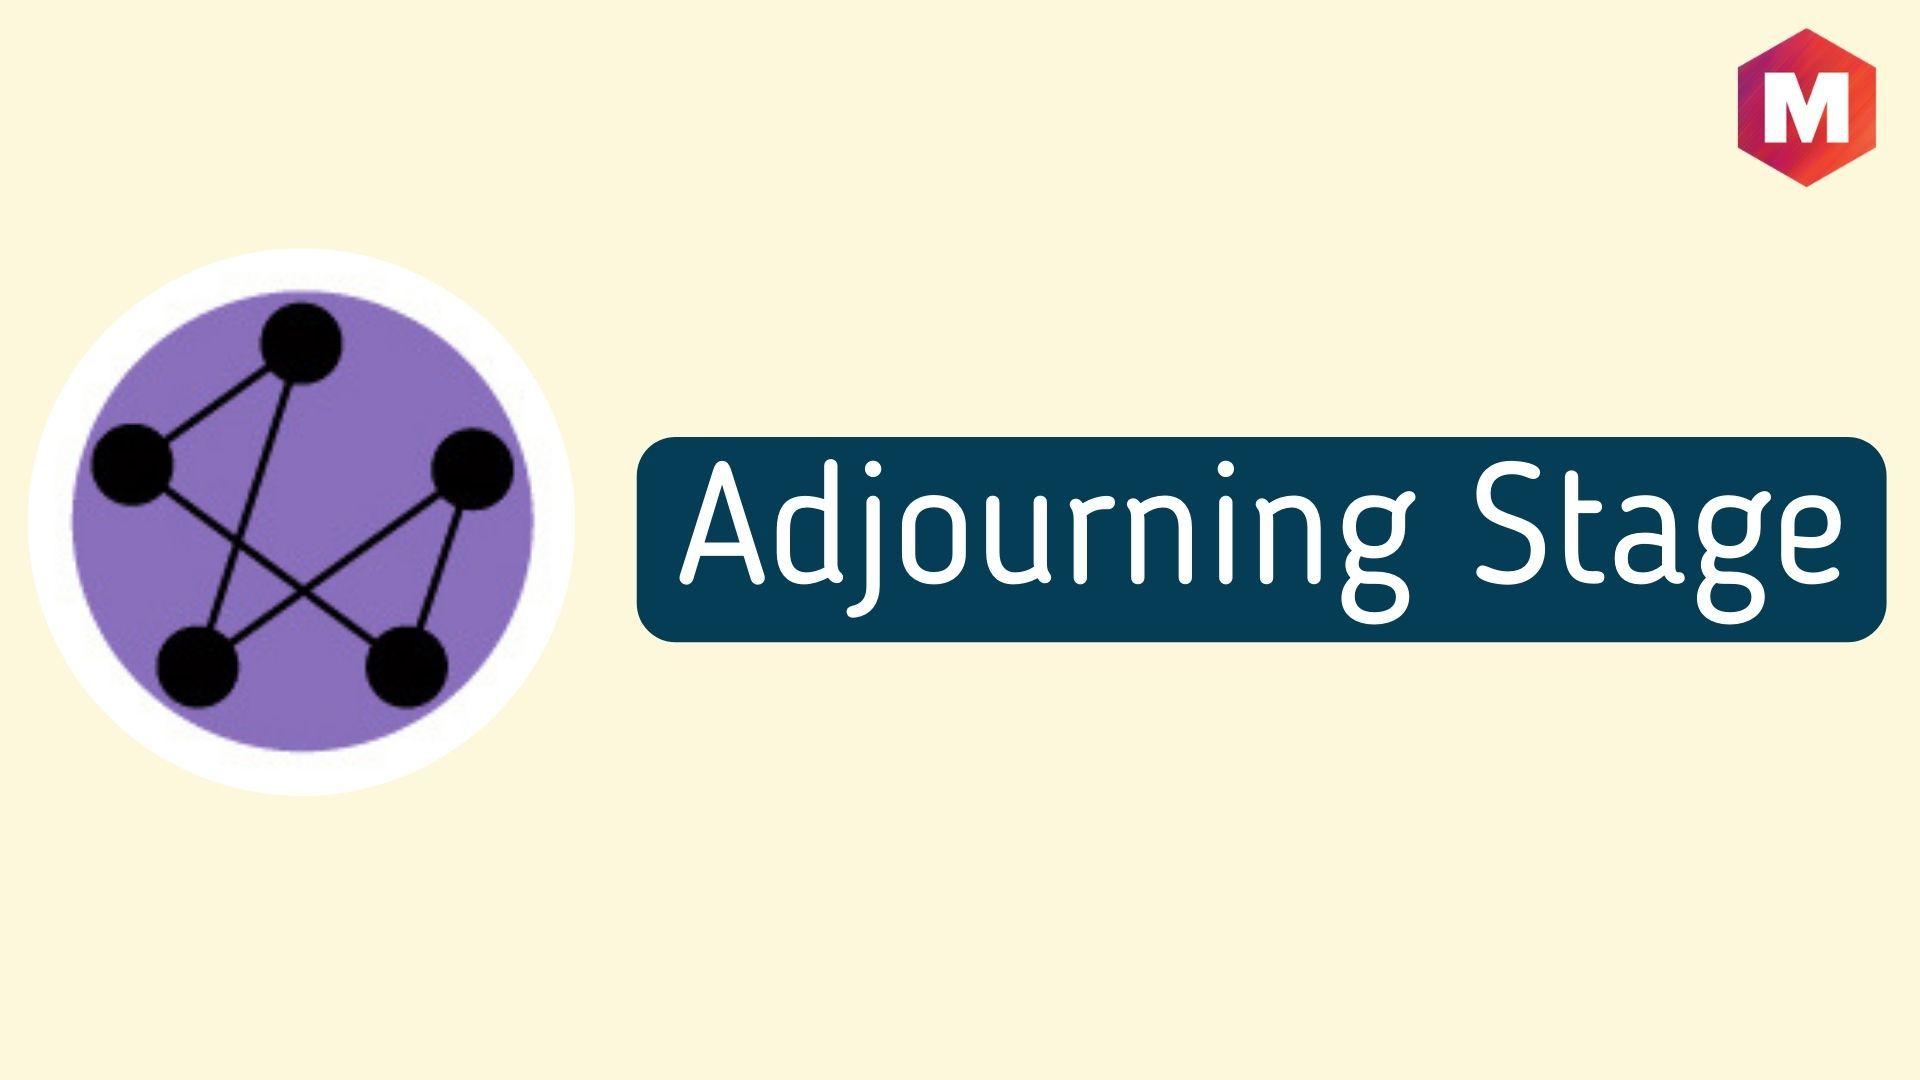 adjourning stage